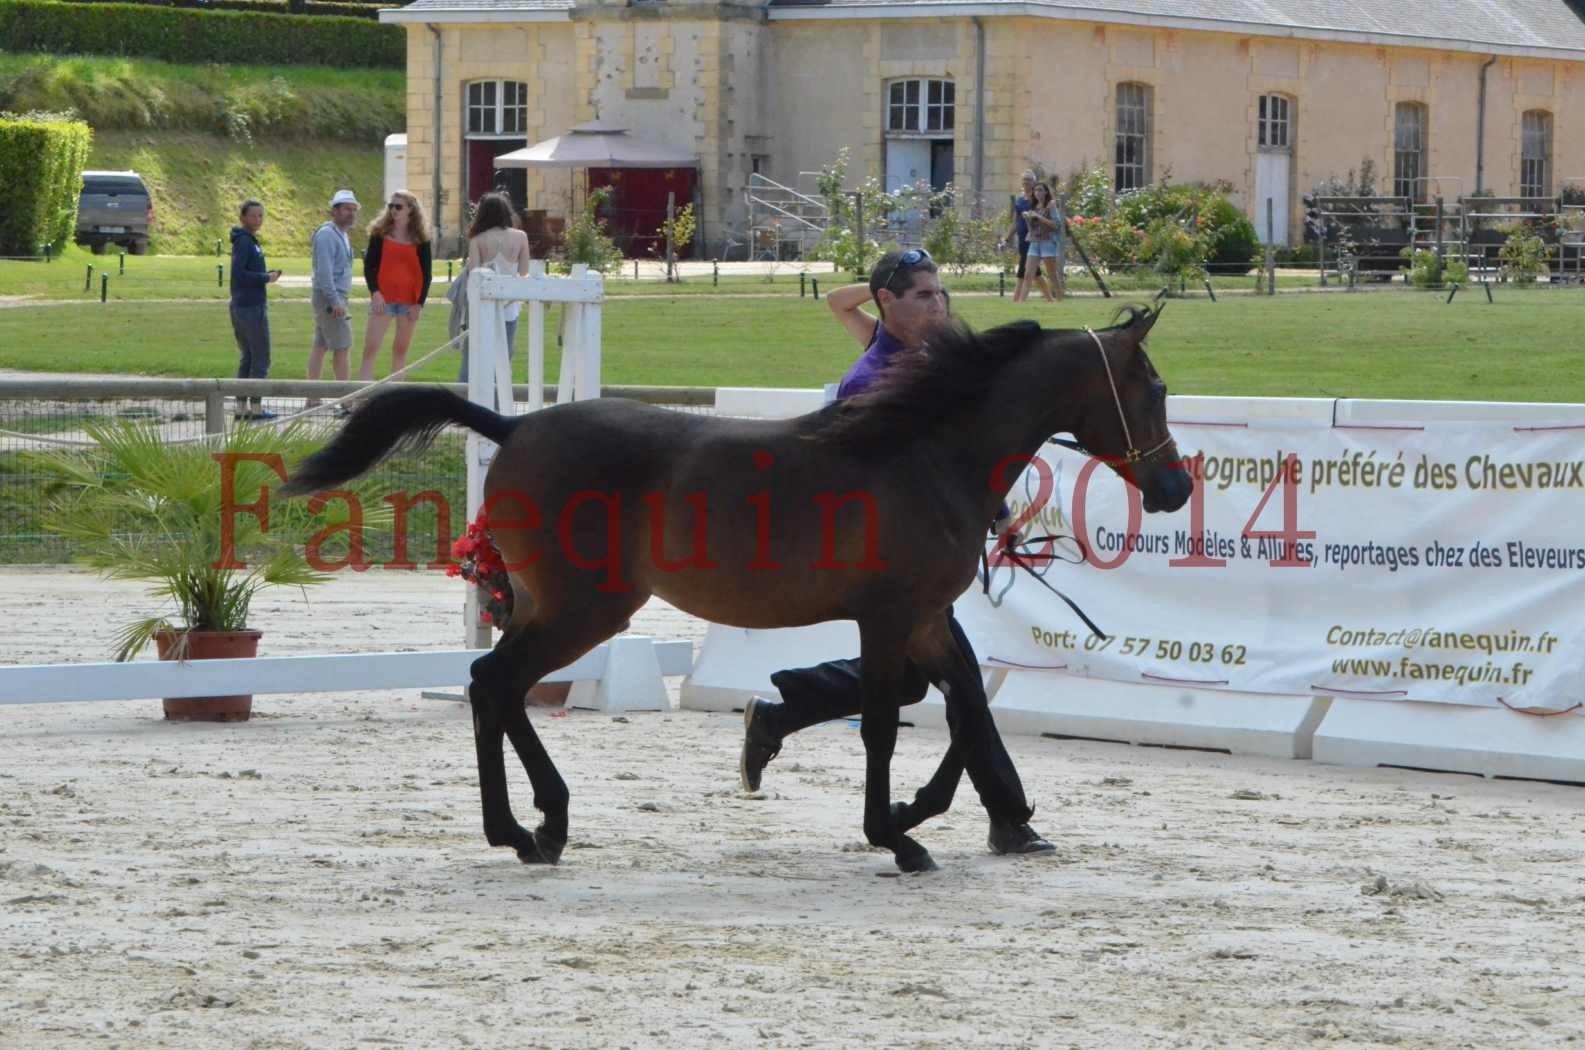 Championnat de FRANCE 2014 - Amateurs - SH FARAJAA - 13